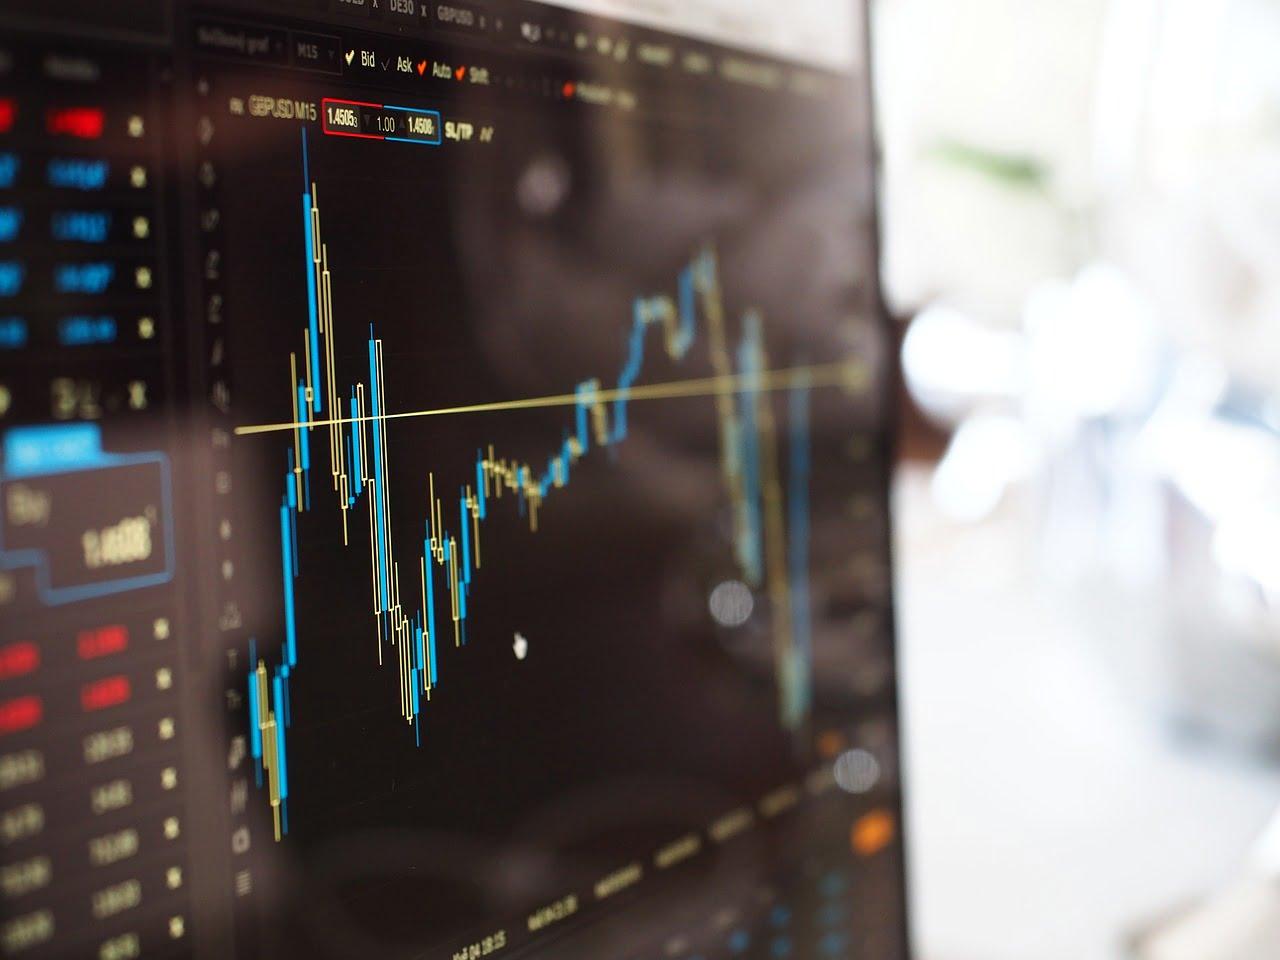 NewsBTC Brazil Bitcoin Stock Market